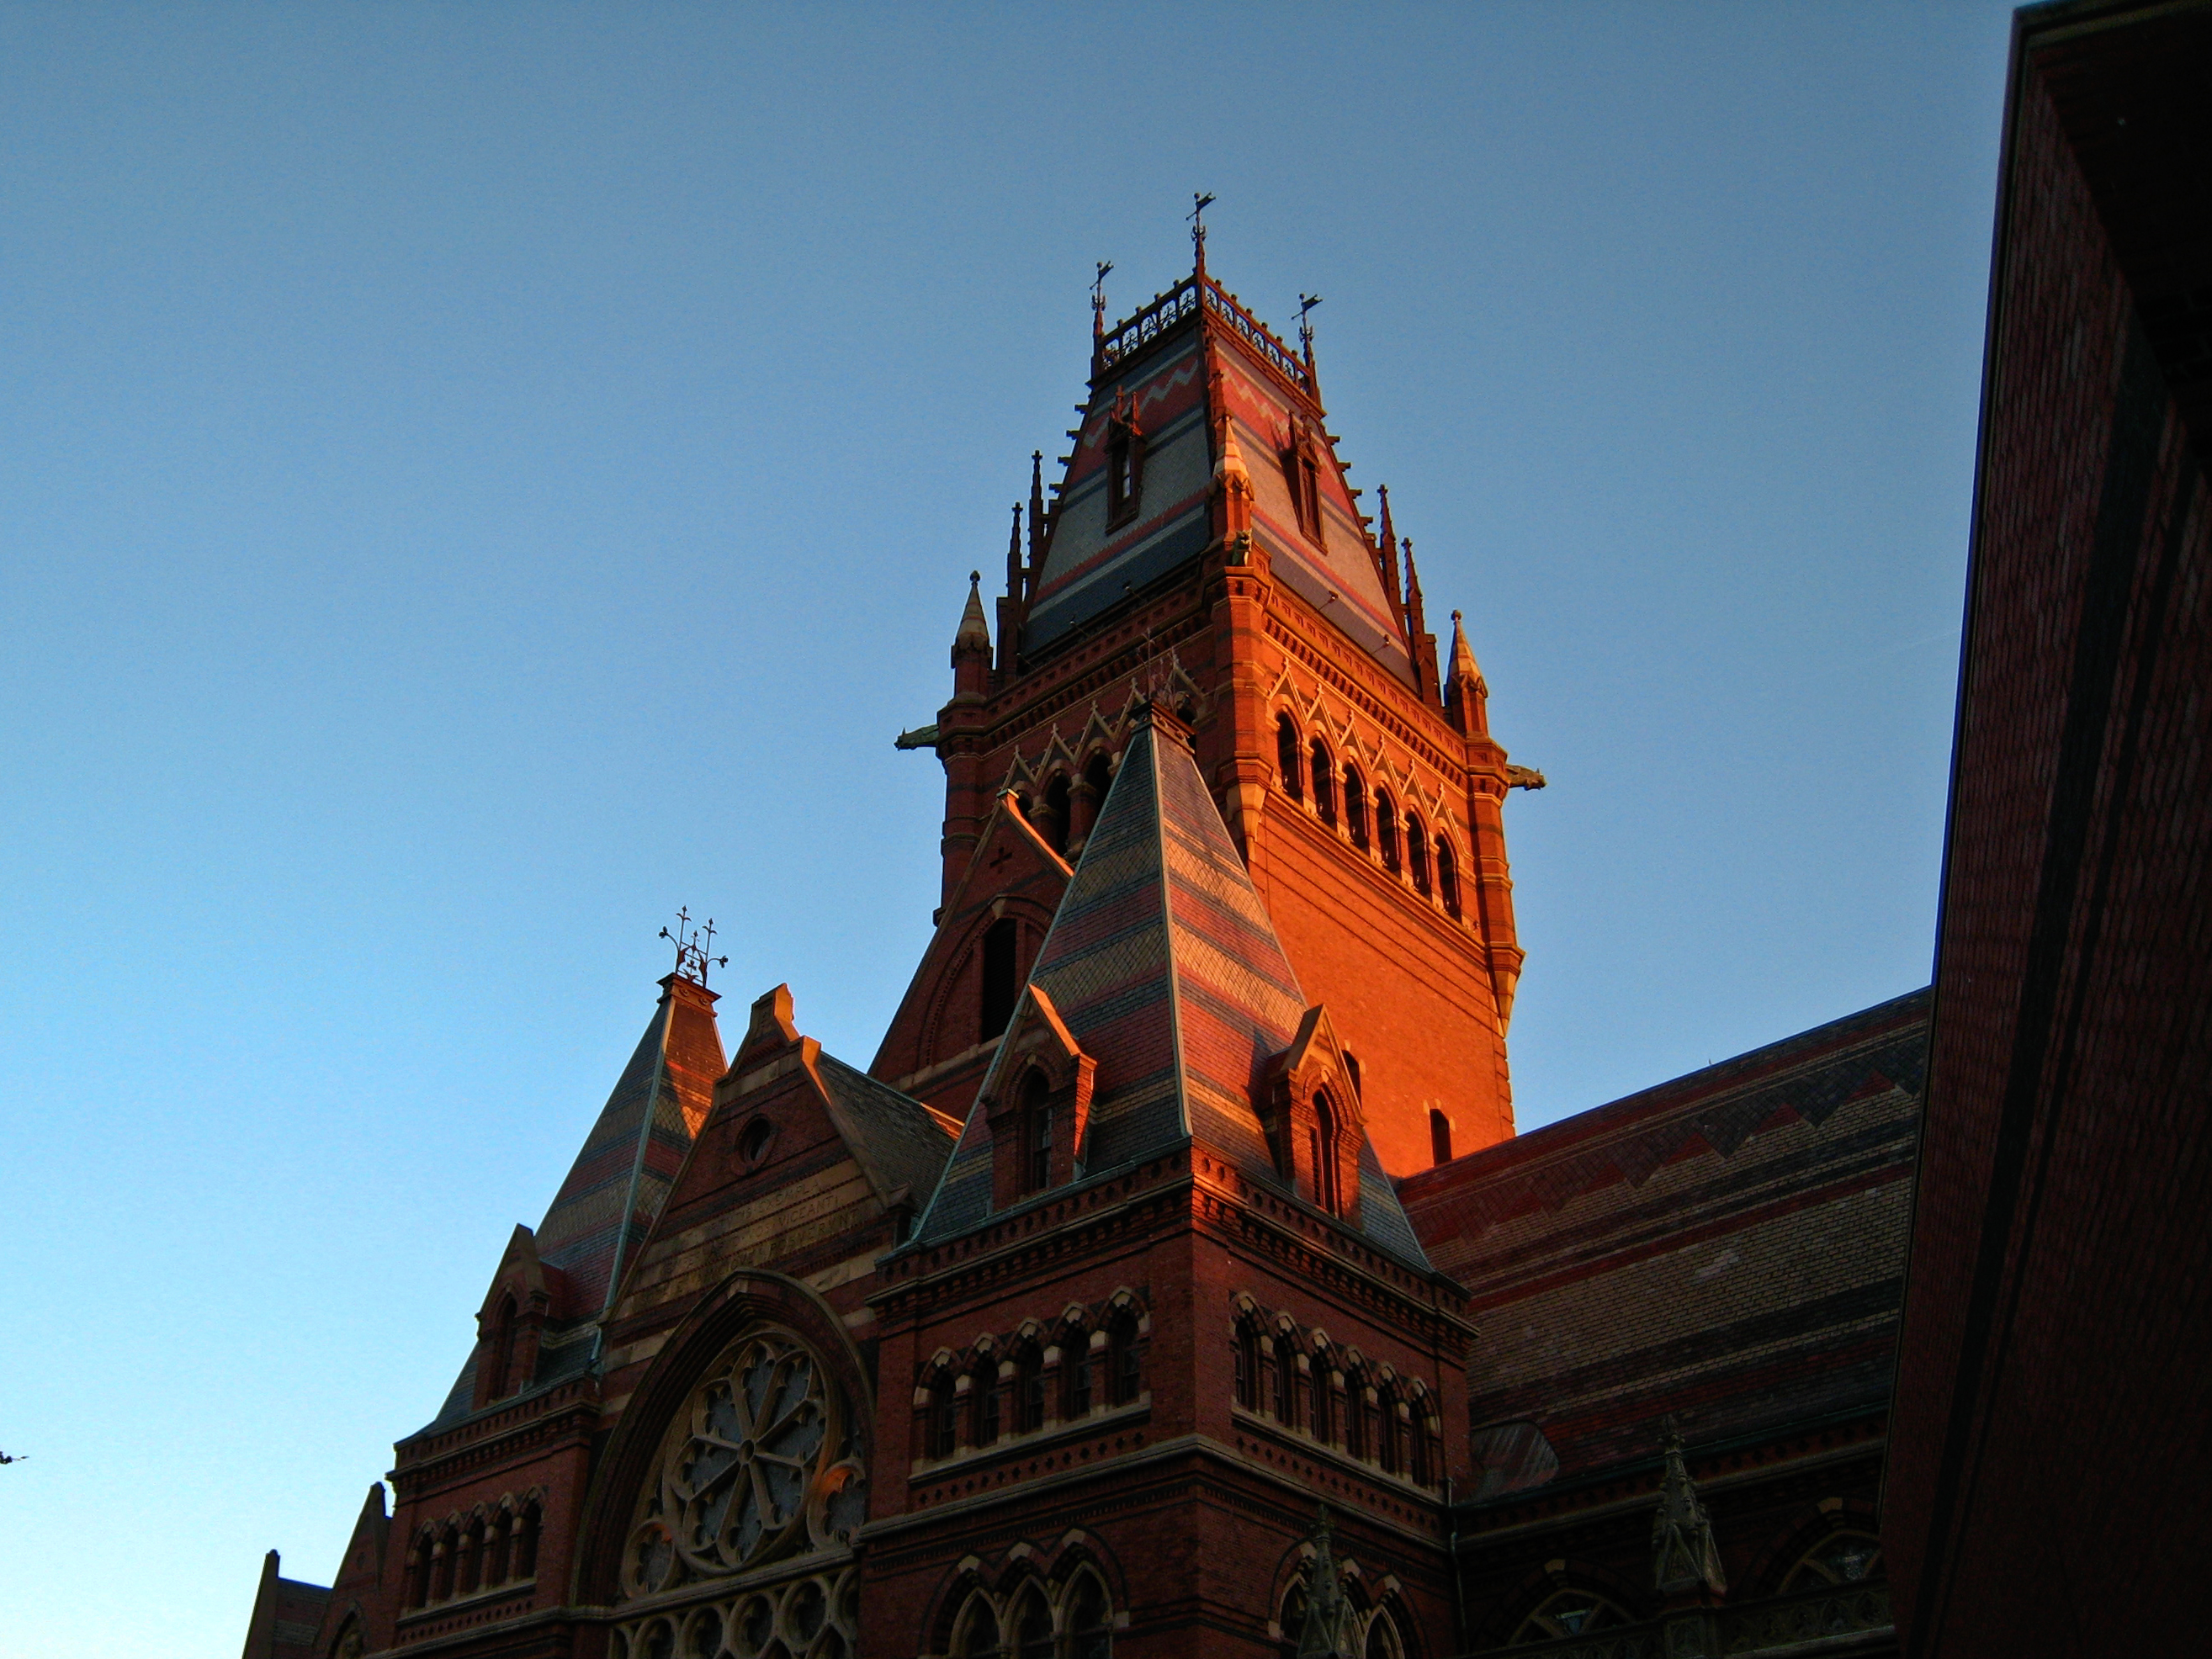 Sanders Theater at Harvard University.